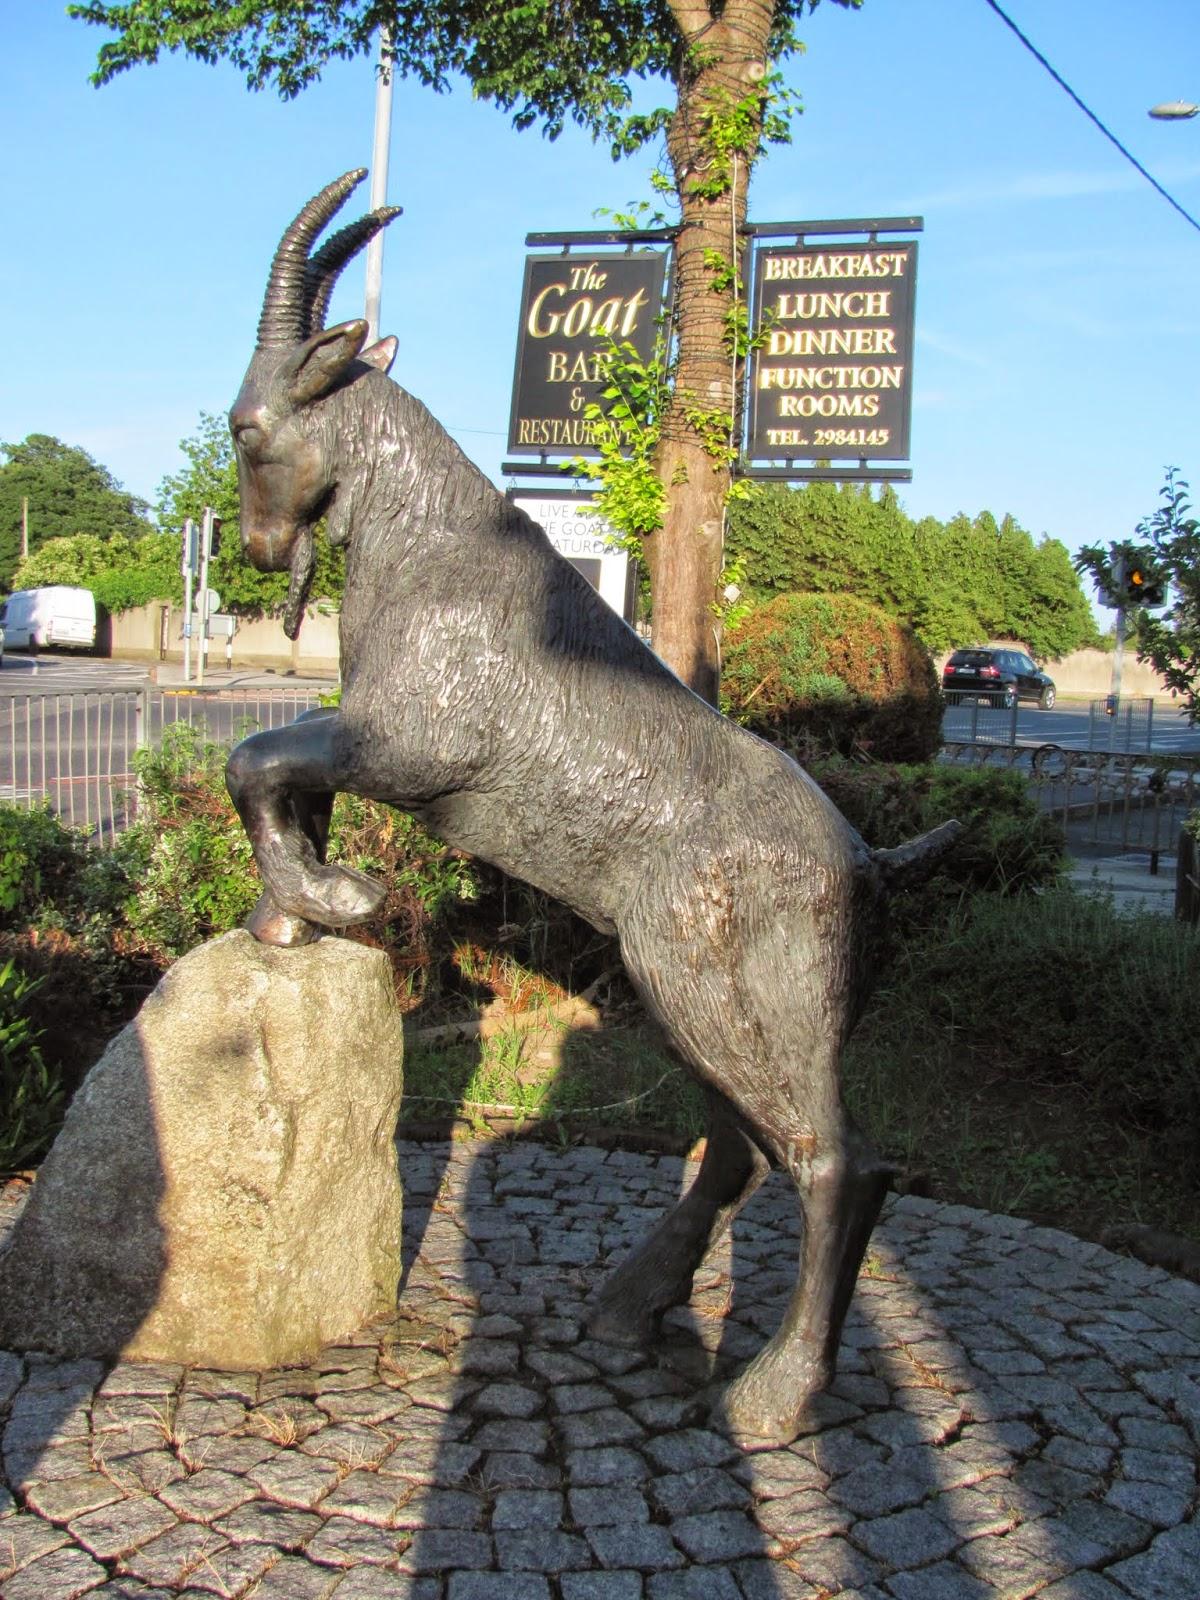 Goat Statue at The Goat Pub, Dublin